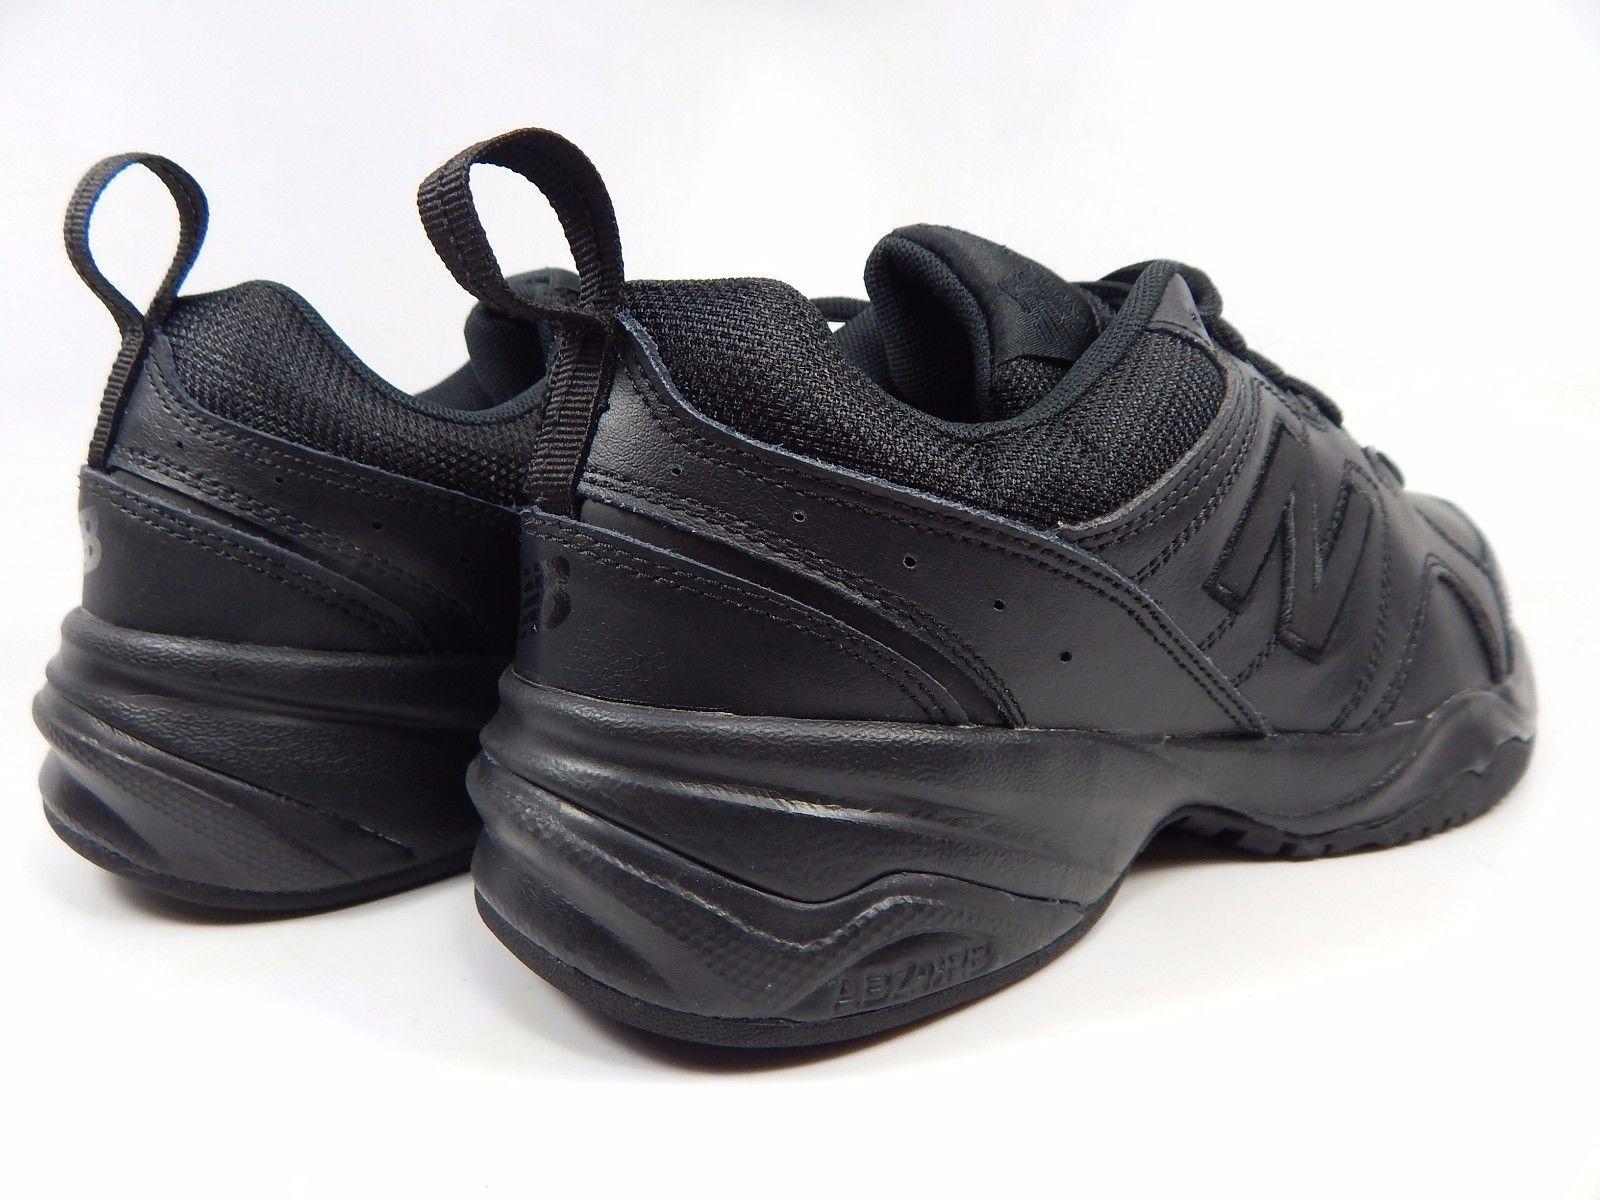 New Balance 609 v3 Men's Training Shoes Size US 8 M (D) EU: 41.5 Black MX609BX3